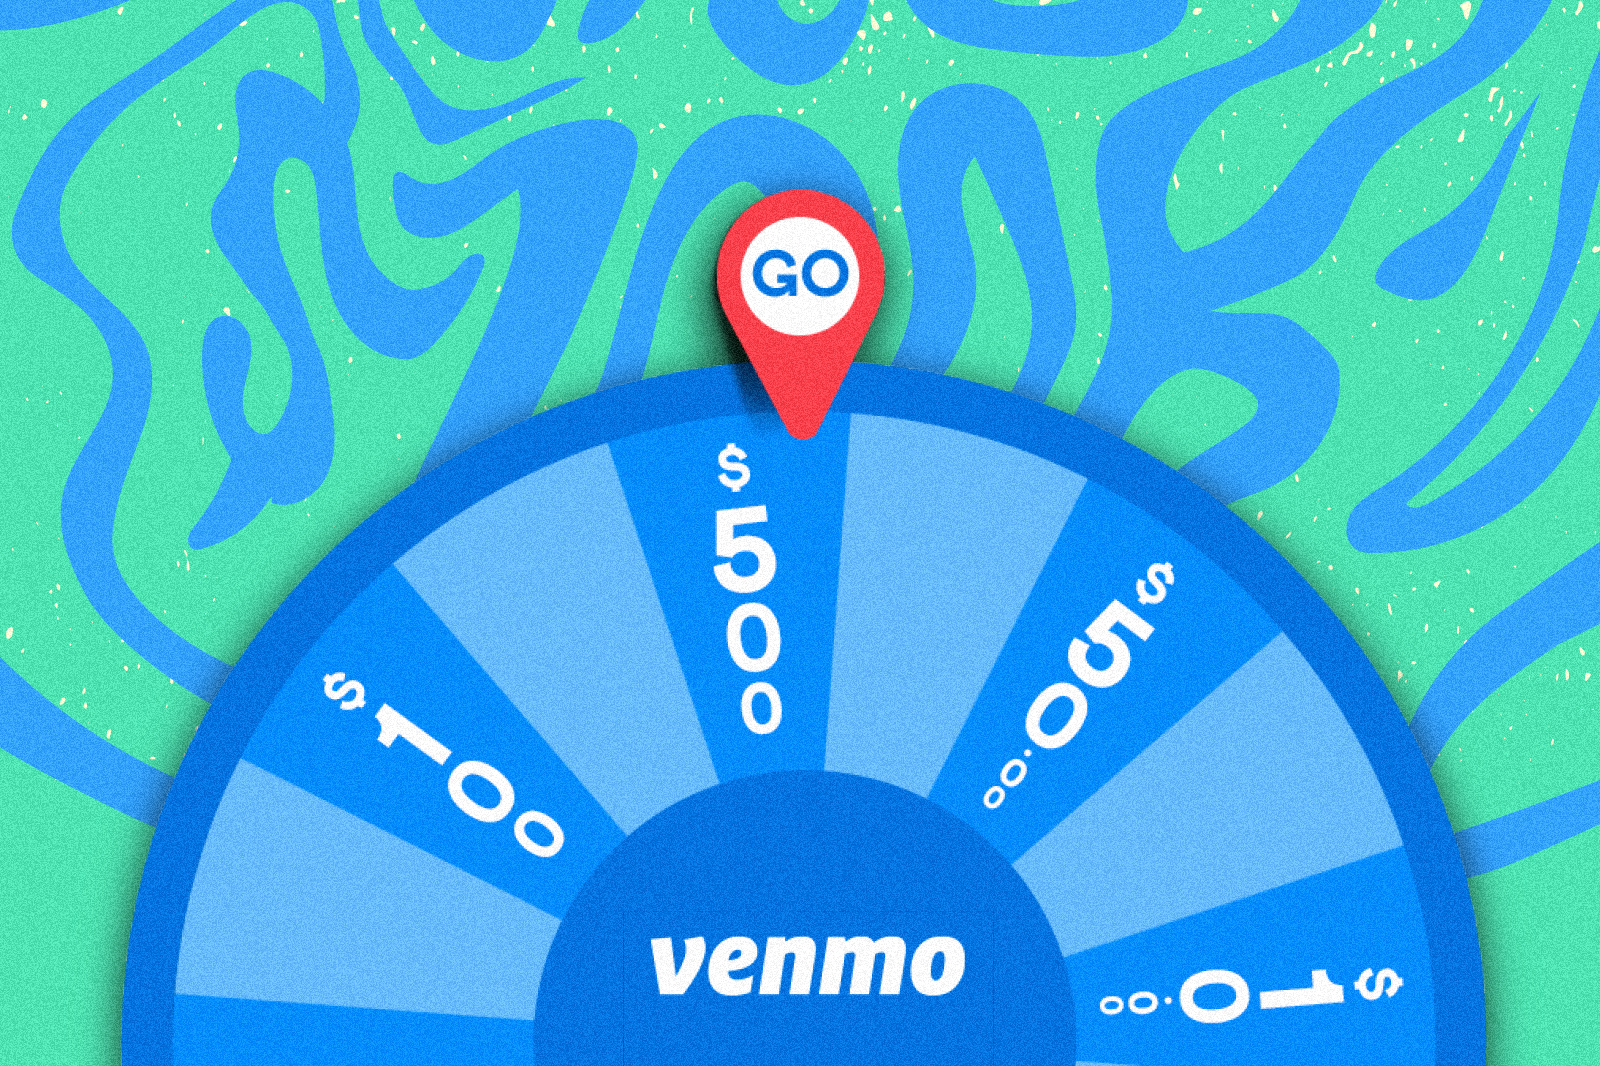 Venmo Spin to Win